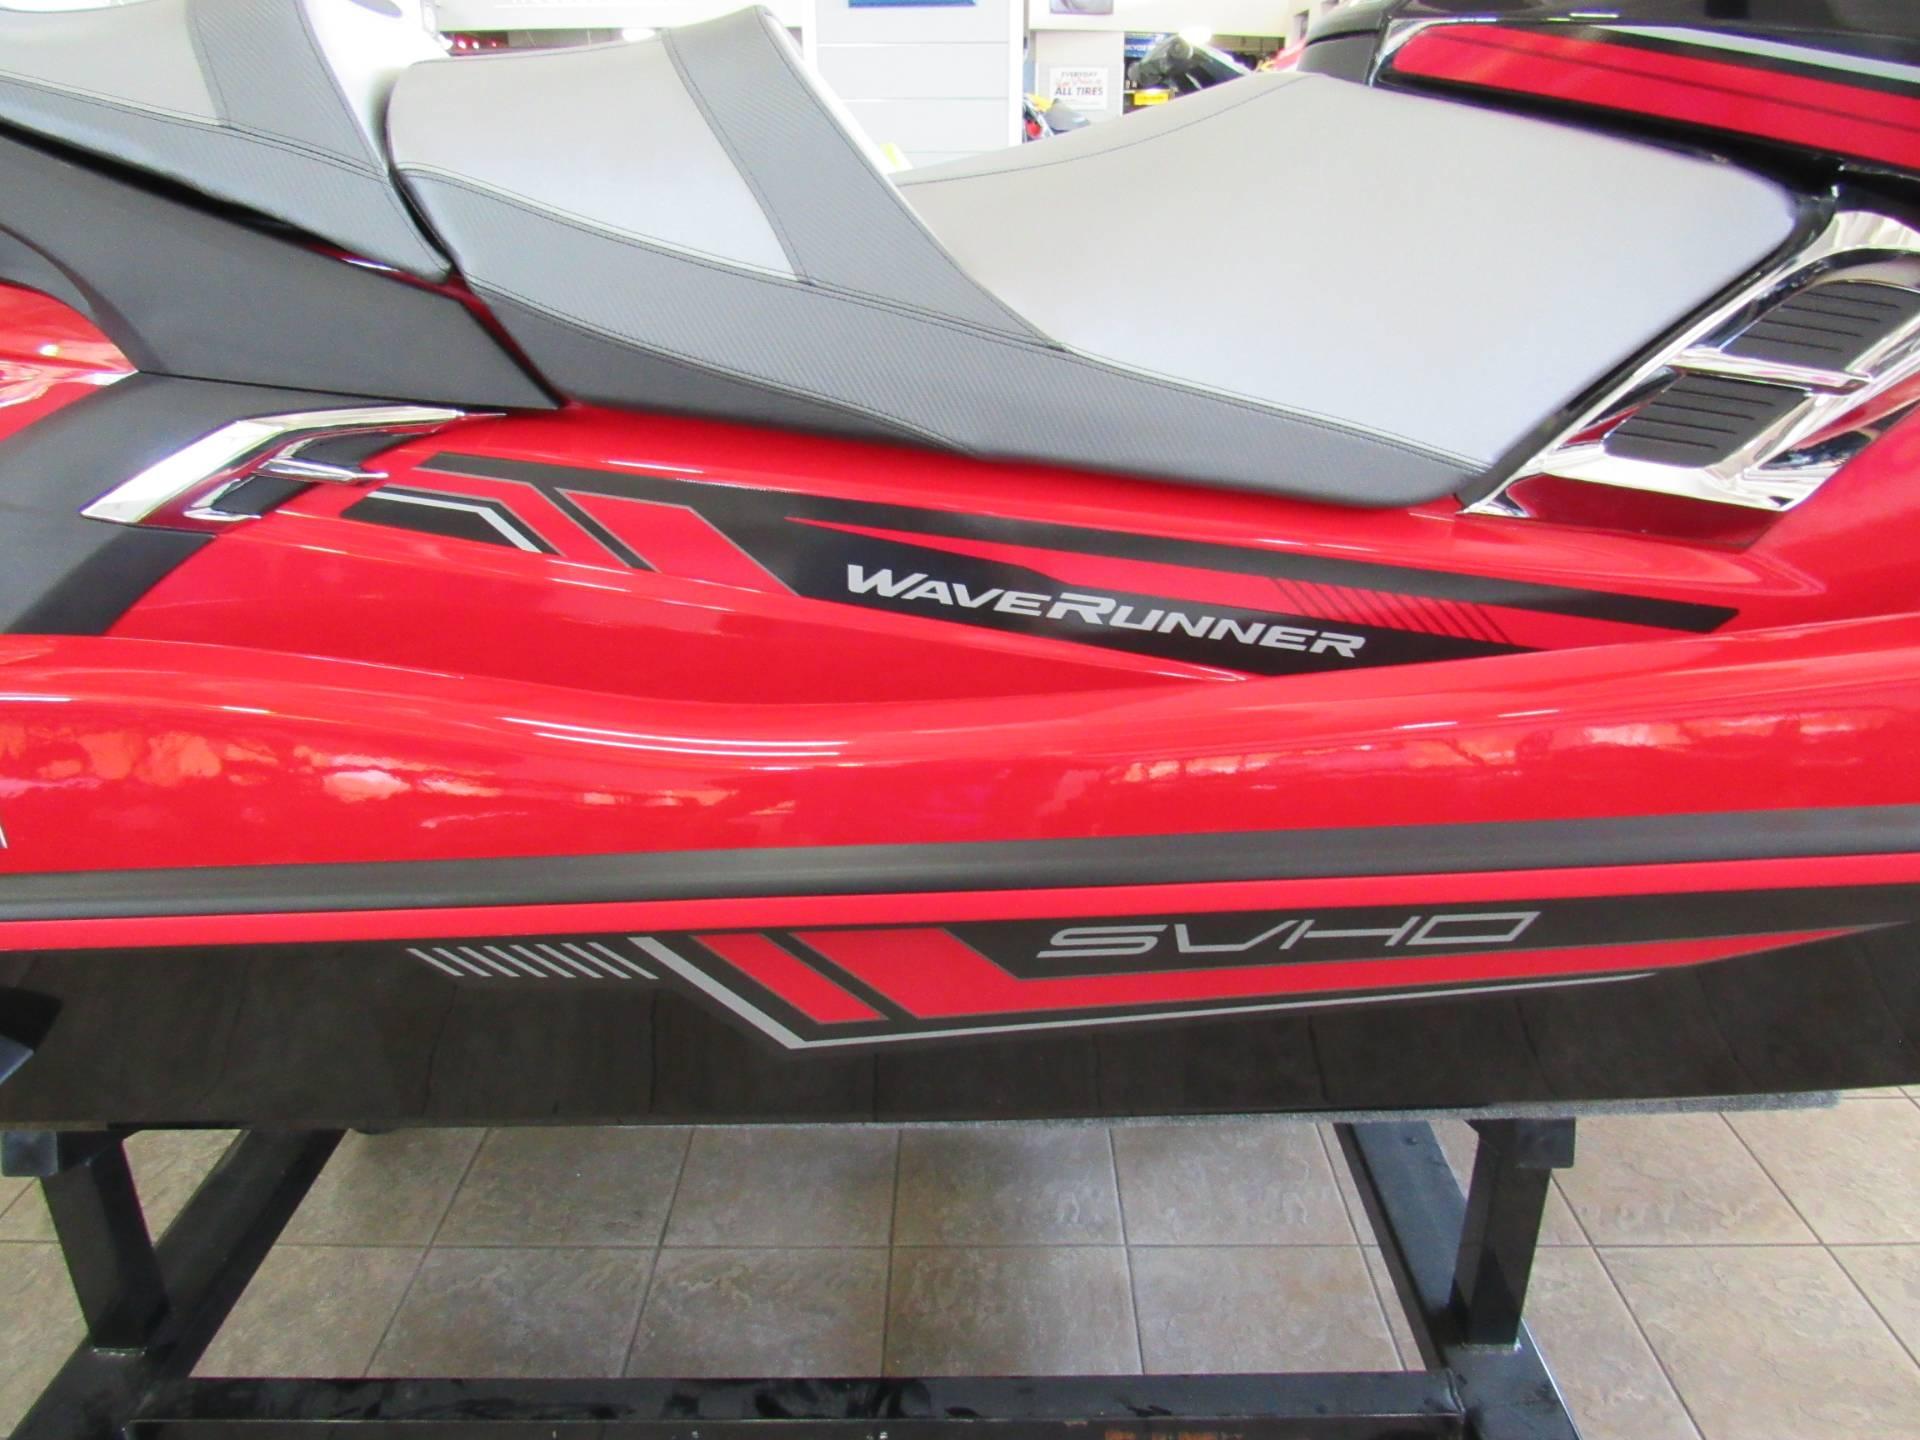 2017 Yamaha FX Cruiser SVHO 2